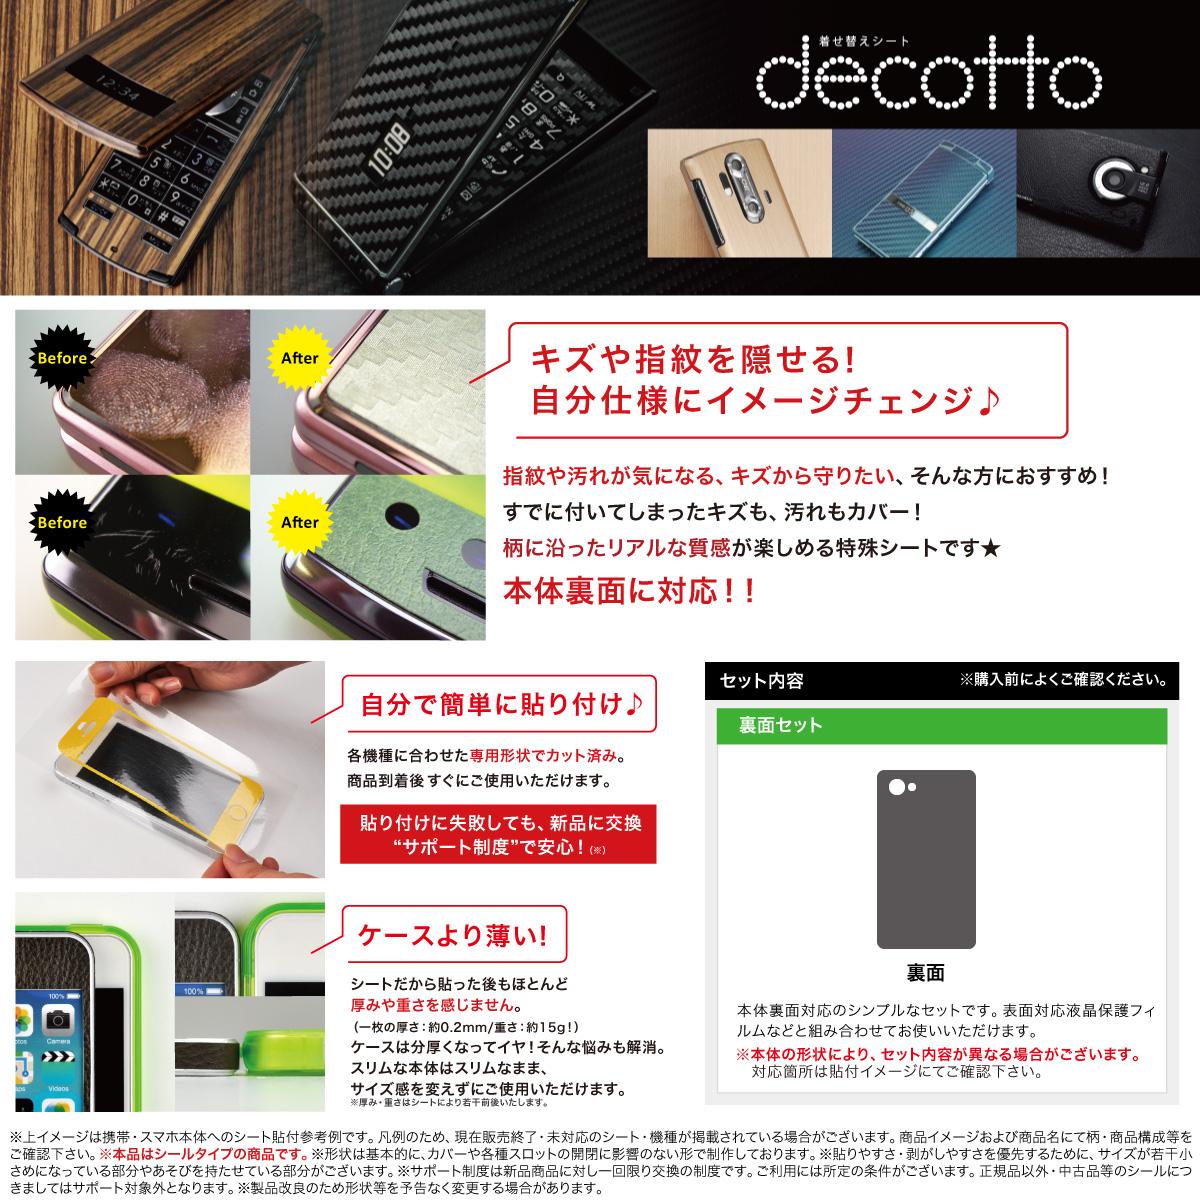 XperiaXZ2 Compact SO-05K 専用 デコ デザインシート decotto 裏面 【 レザー・カーボン他 柄が選べます】